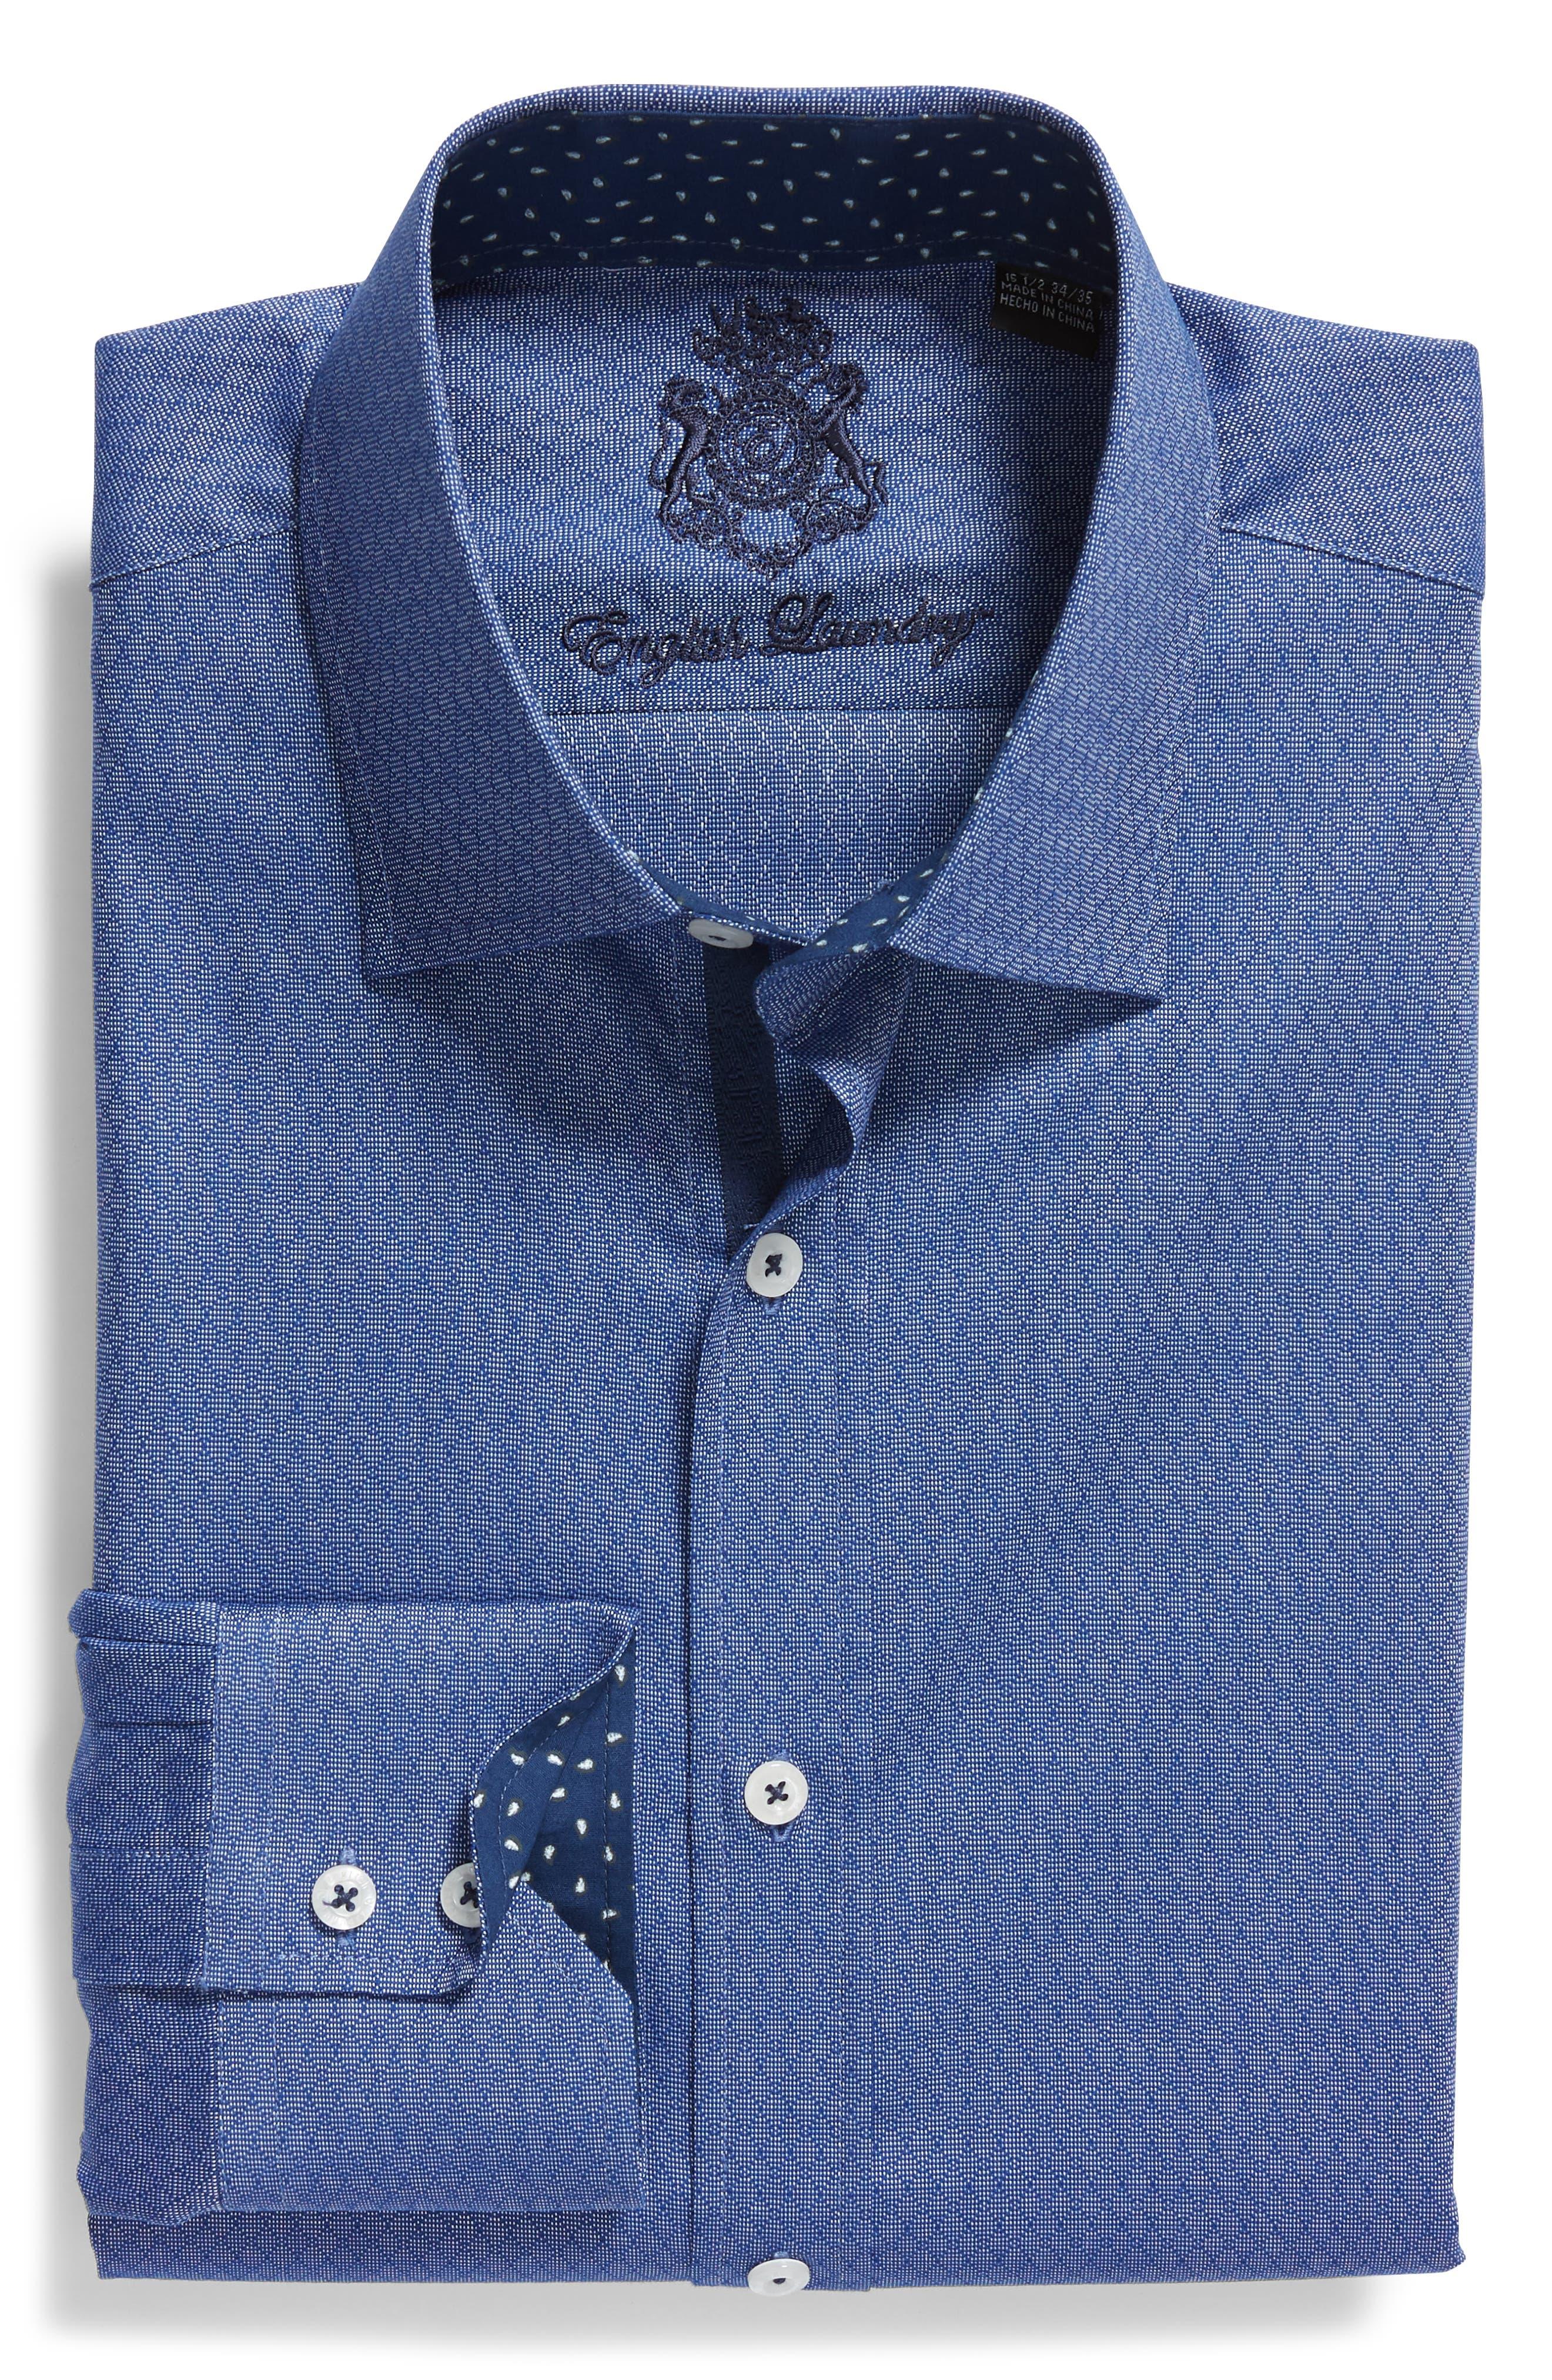 Pattern Regular Fit Dress Shirt,                             Alternate thumbnail 5, color,                             NAVY